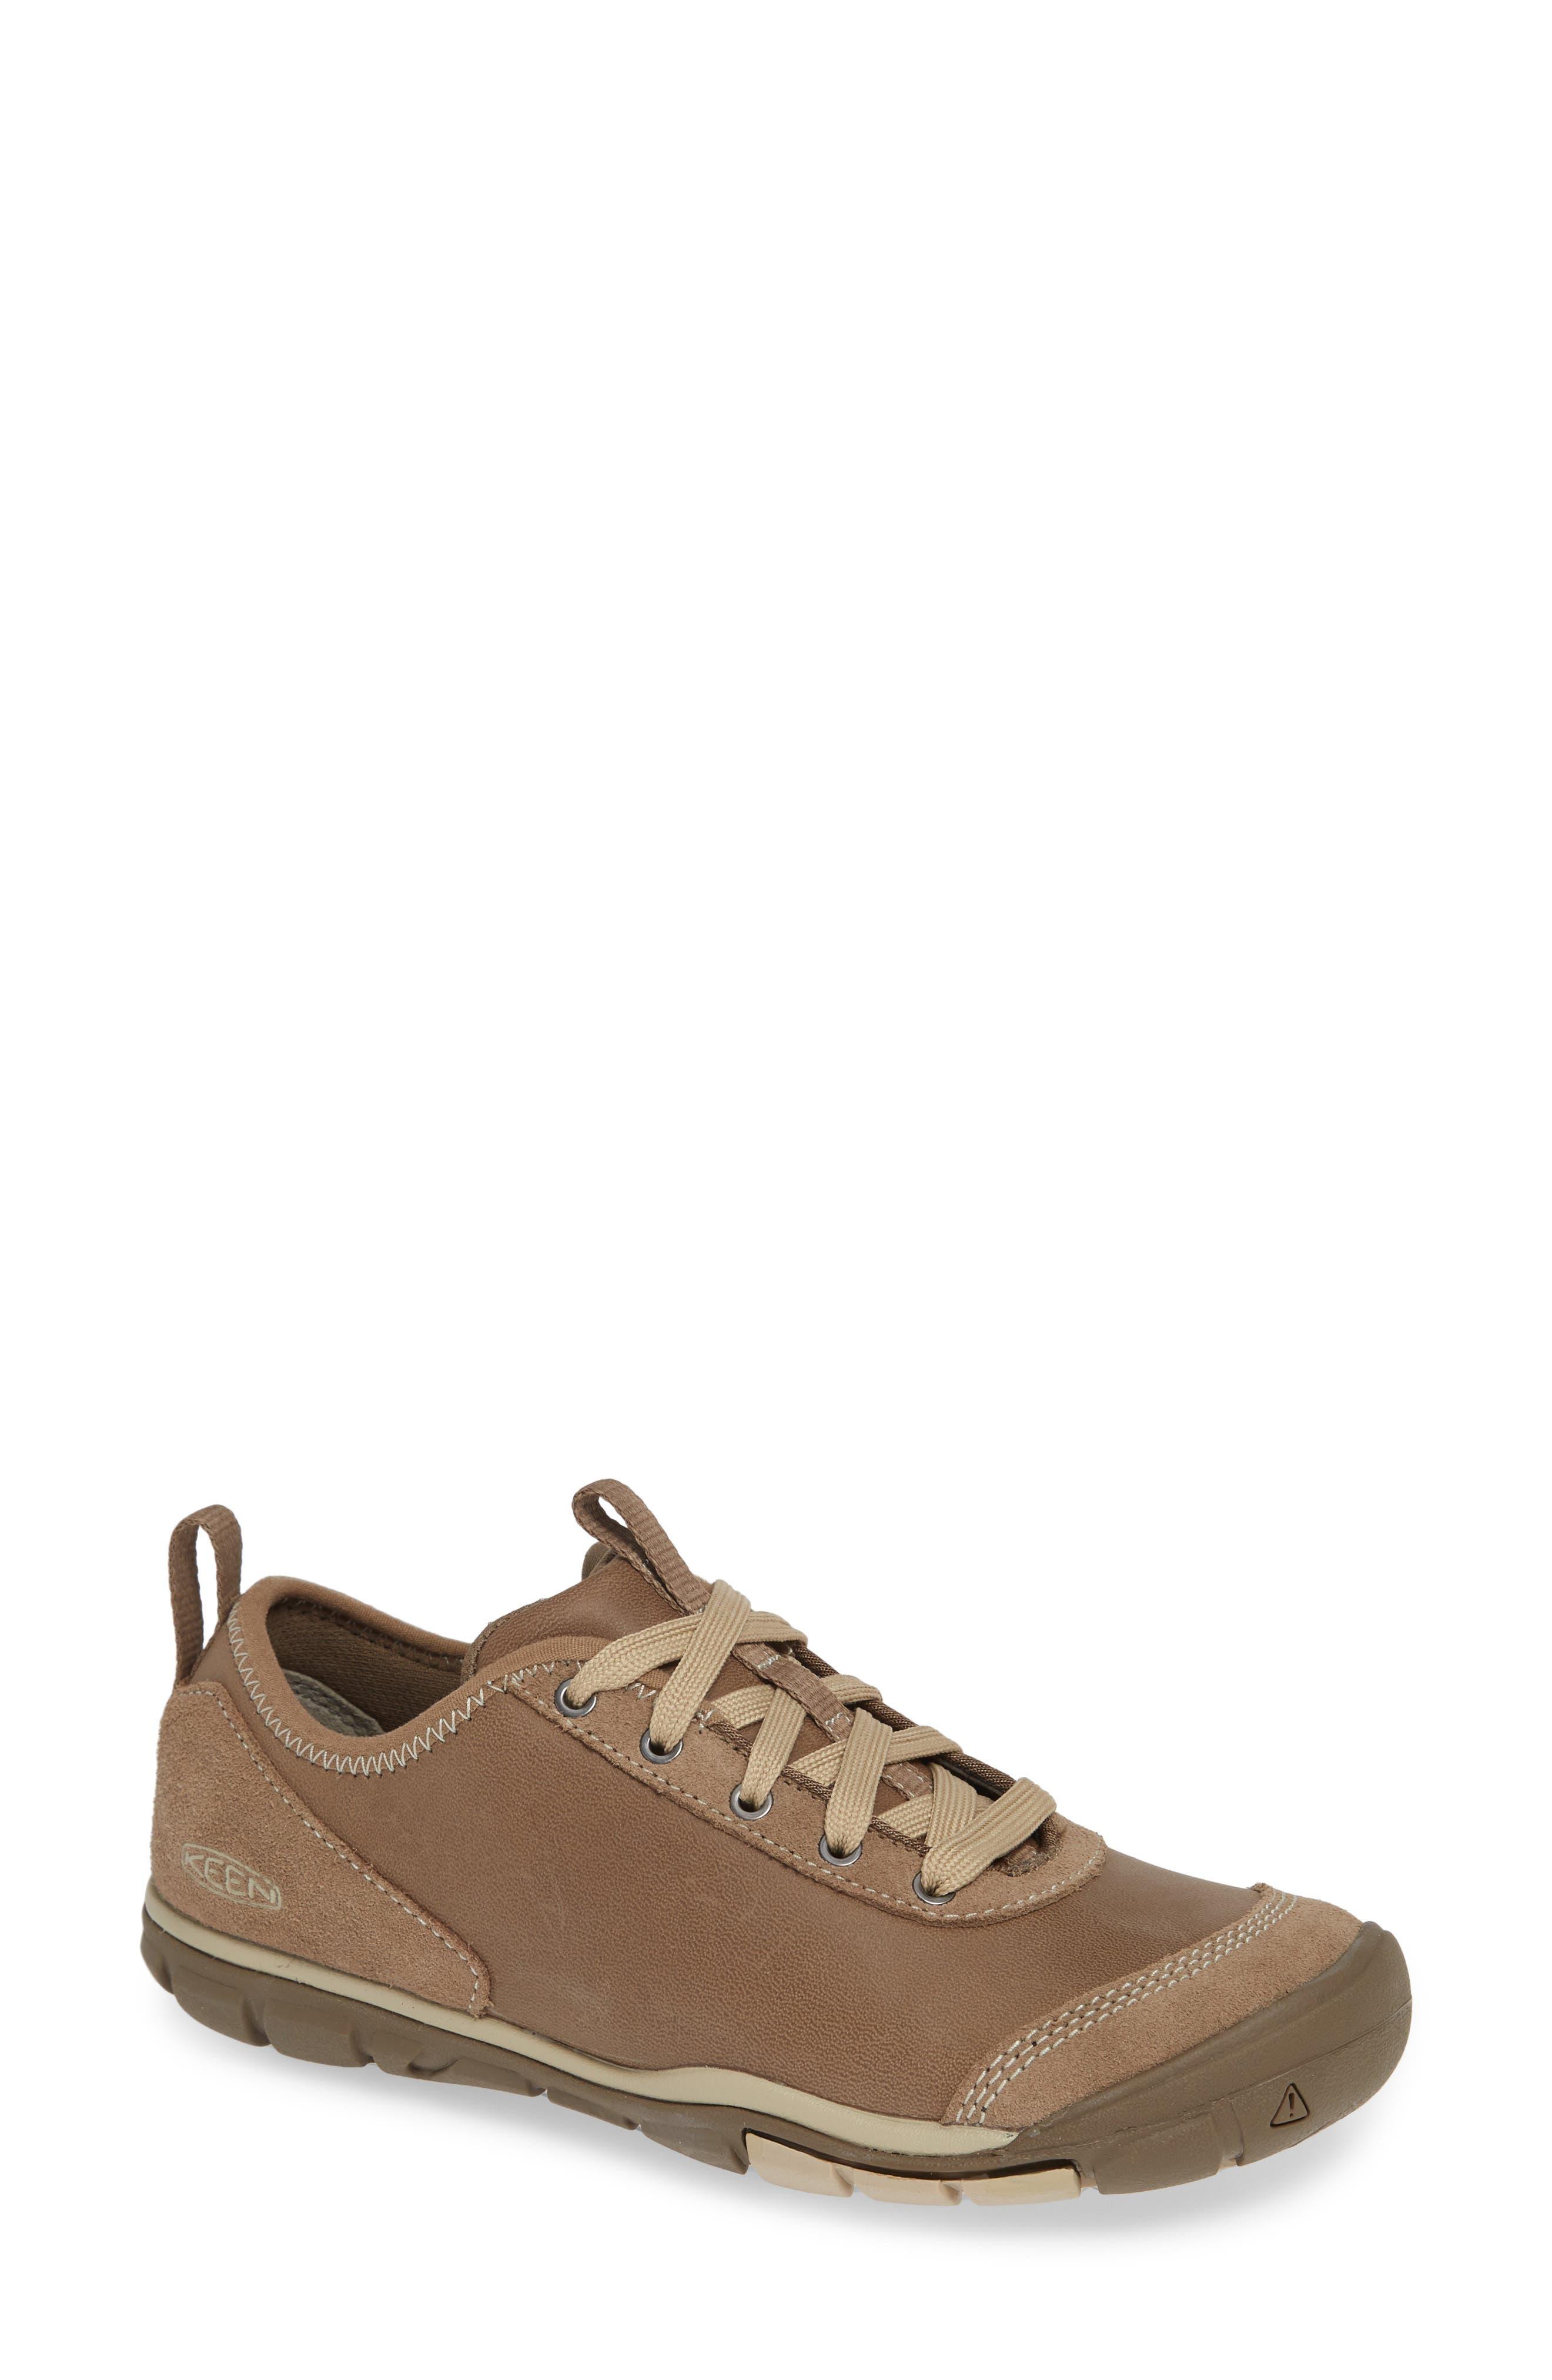 Keen Hush Lea Sneaker, Brown